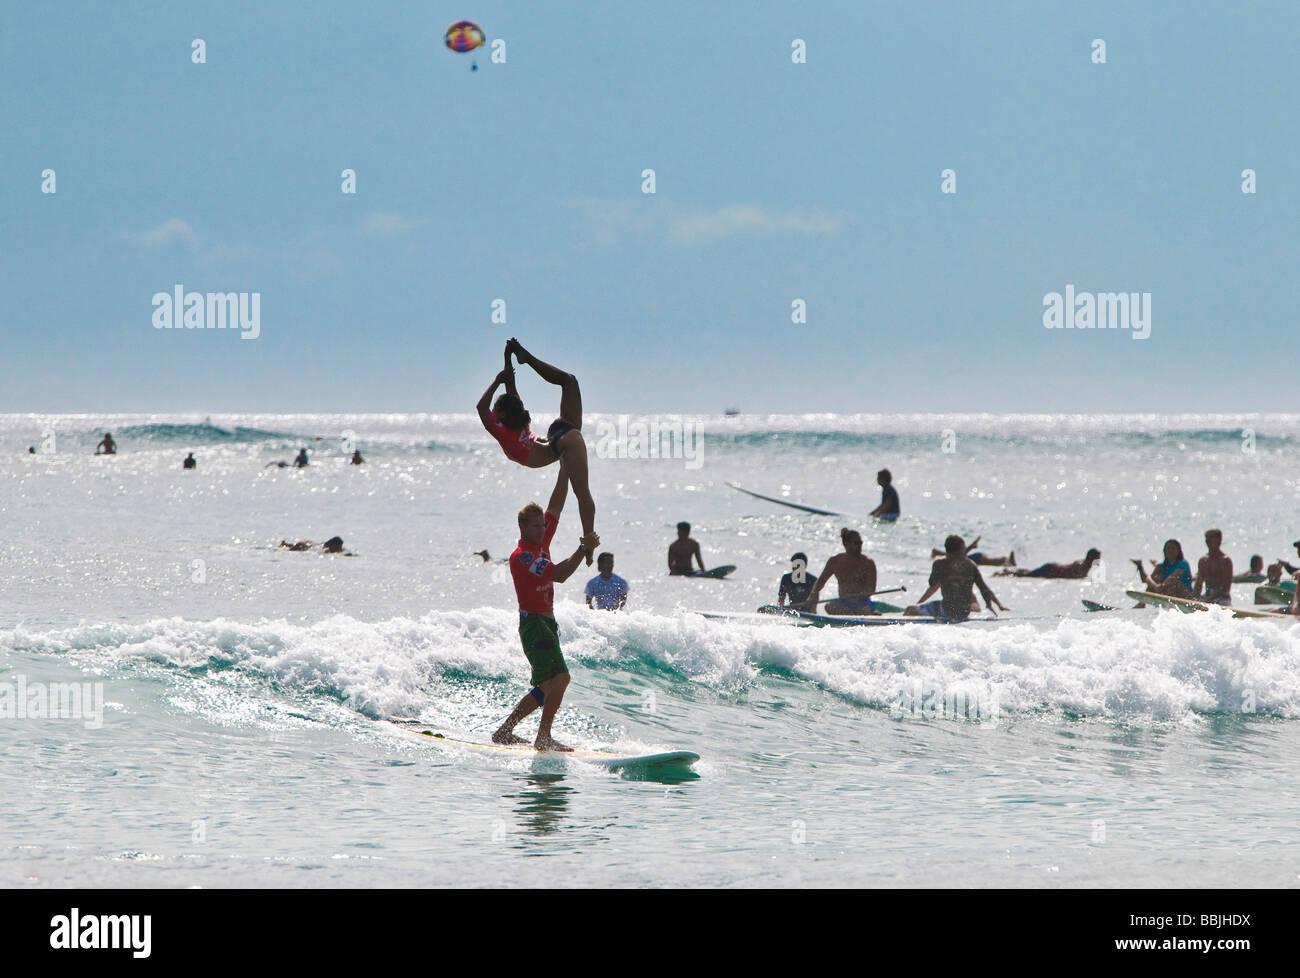 Couple Tandem Surfing Waikiki Beach Honolulu Oahu Hawaii